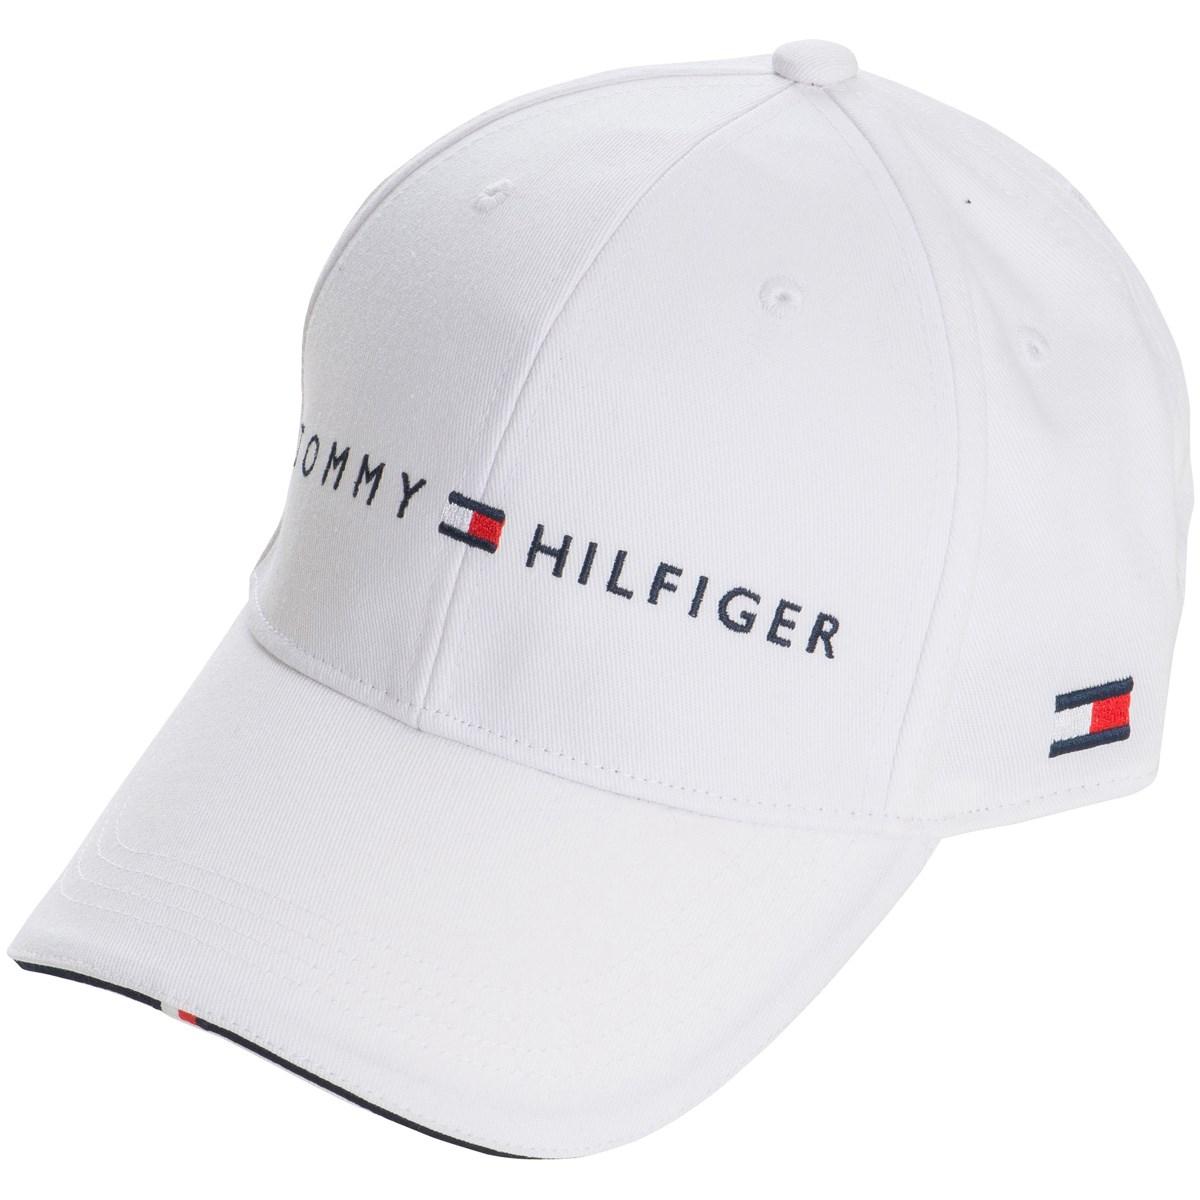 731534b9fcd TH LOGO キャップ トミー ヒルフィガー ゴルフ TOMMY HILFIGER GOLF ...